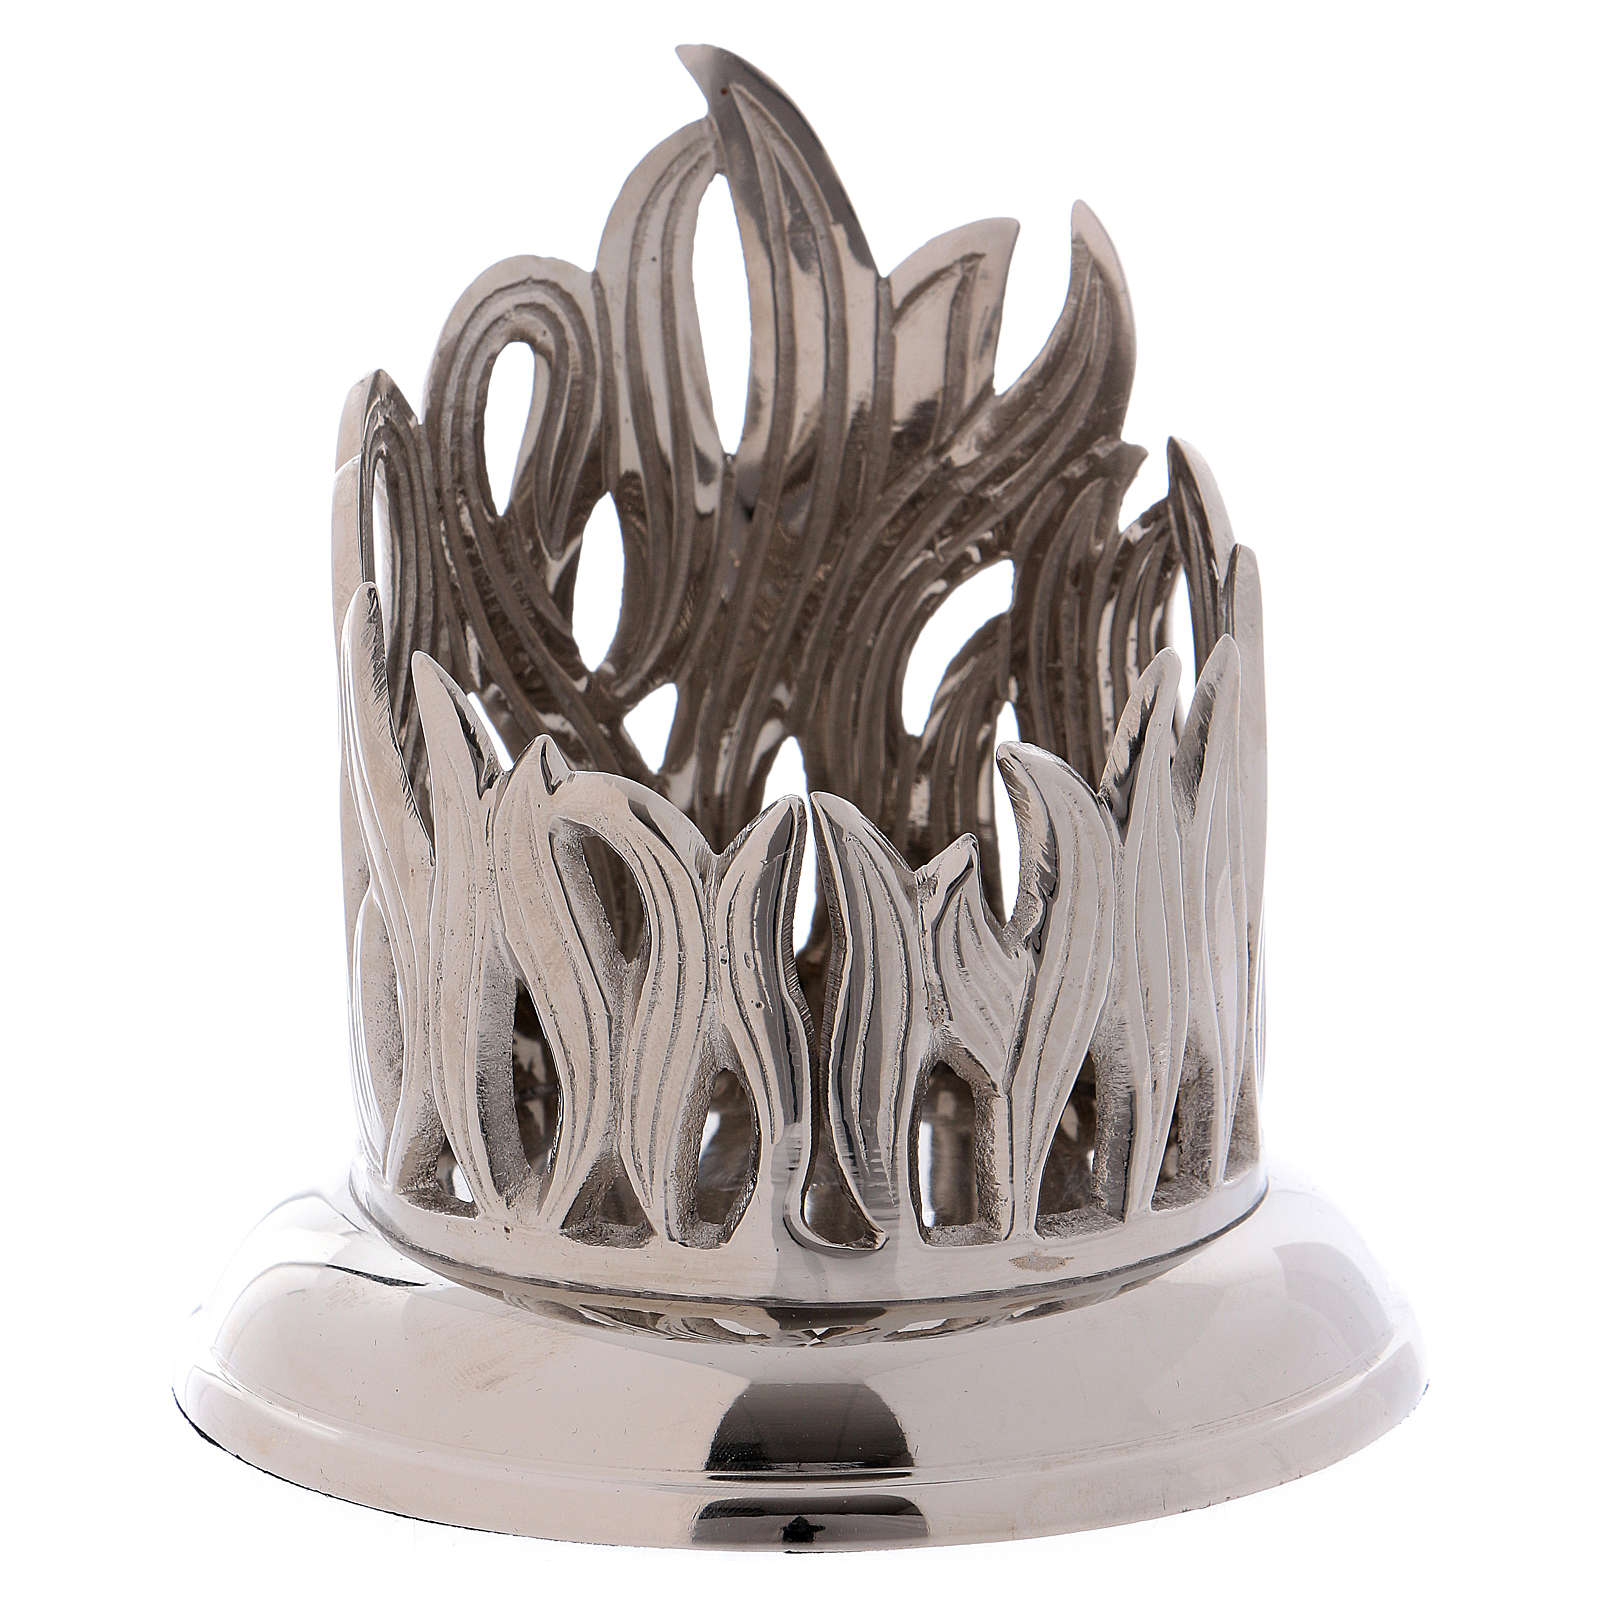 Portacandela ottone argento decoro fiamma 7 cm 4